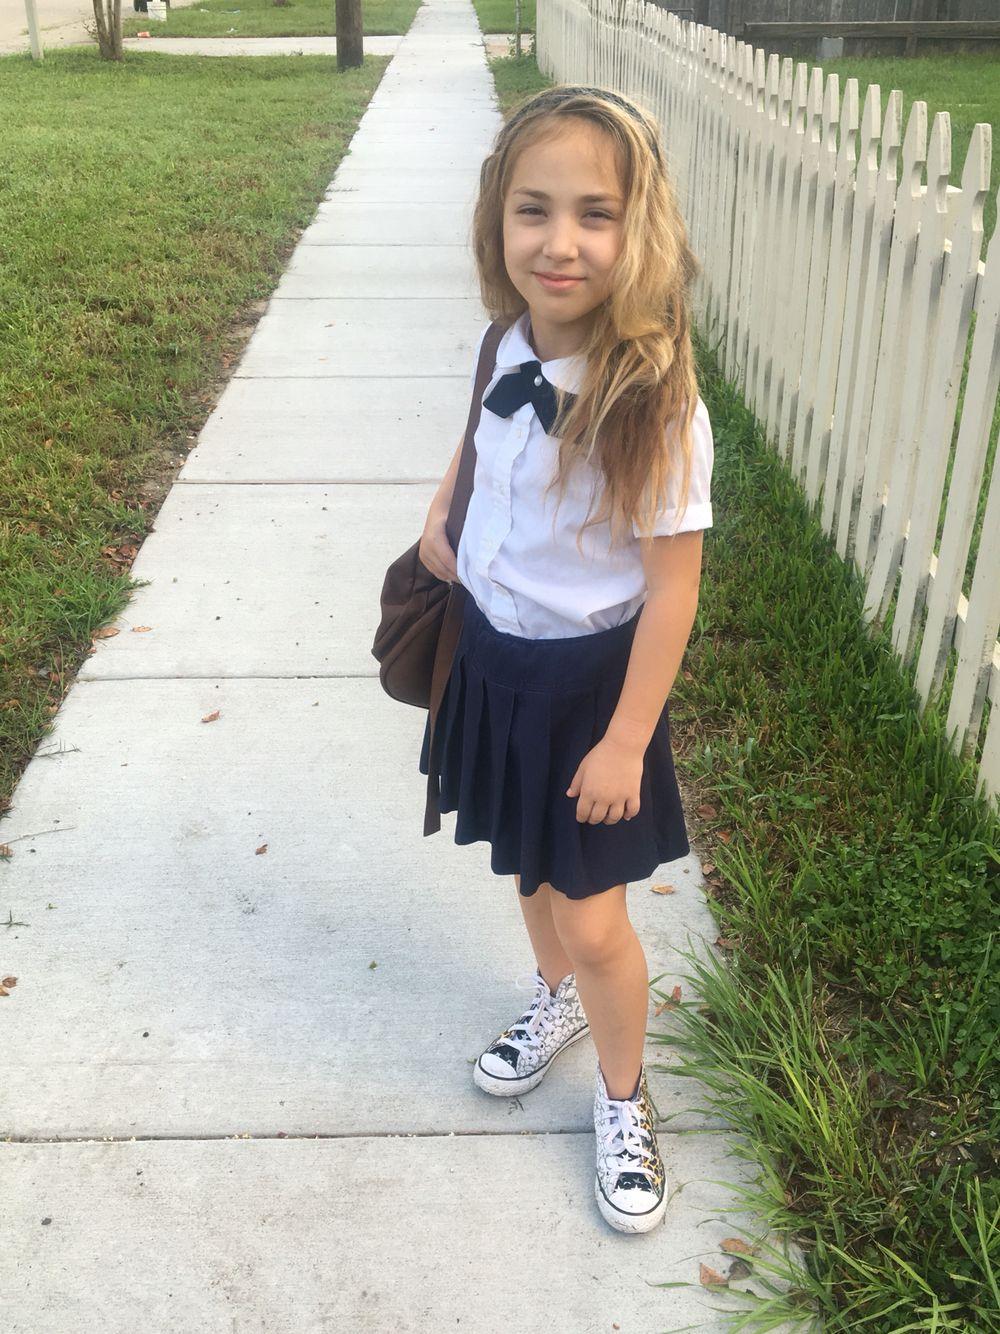 3c33d2a9ff Peter Pan Blouses wirh pleated skirt #schooluniforms | School ...